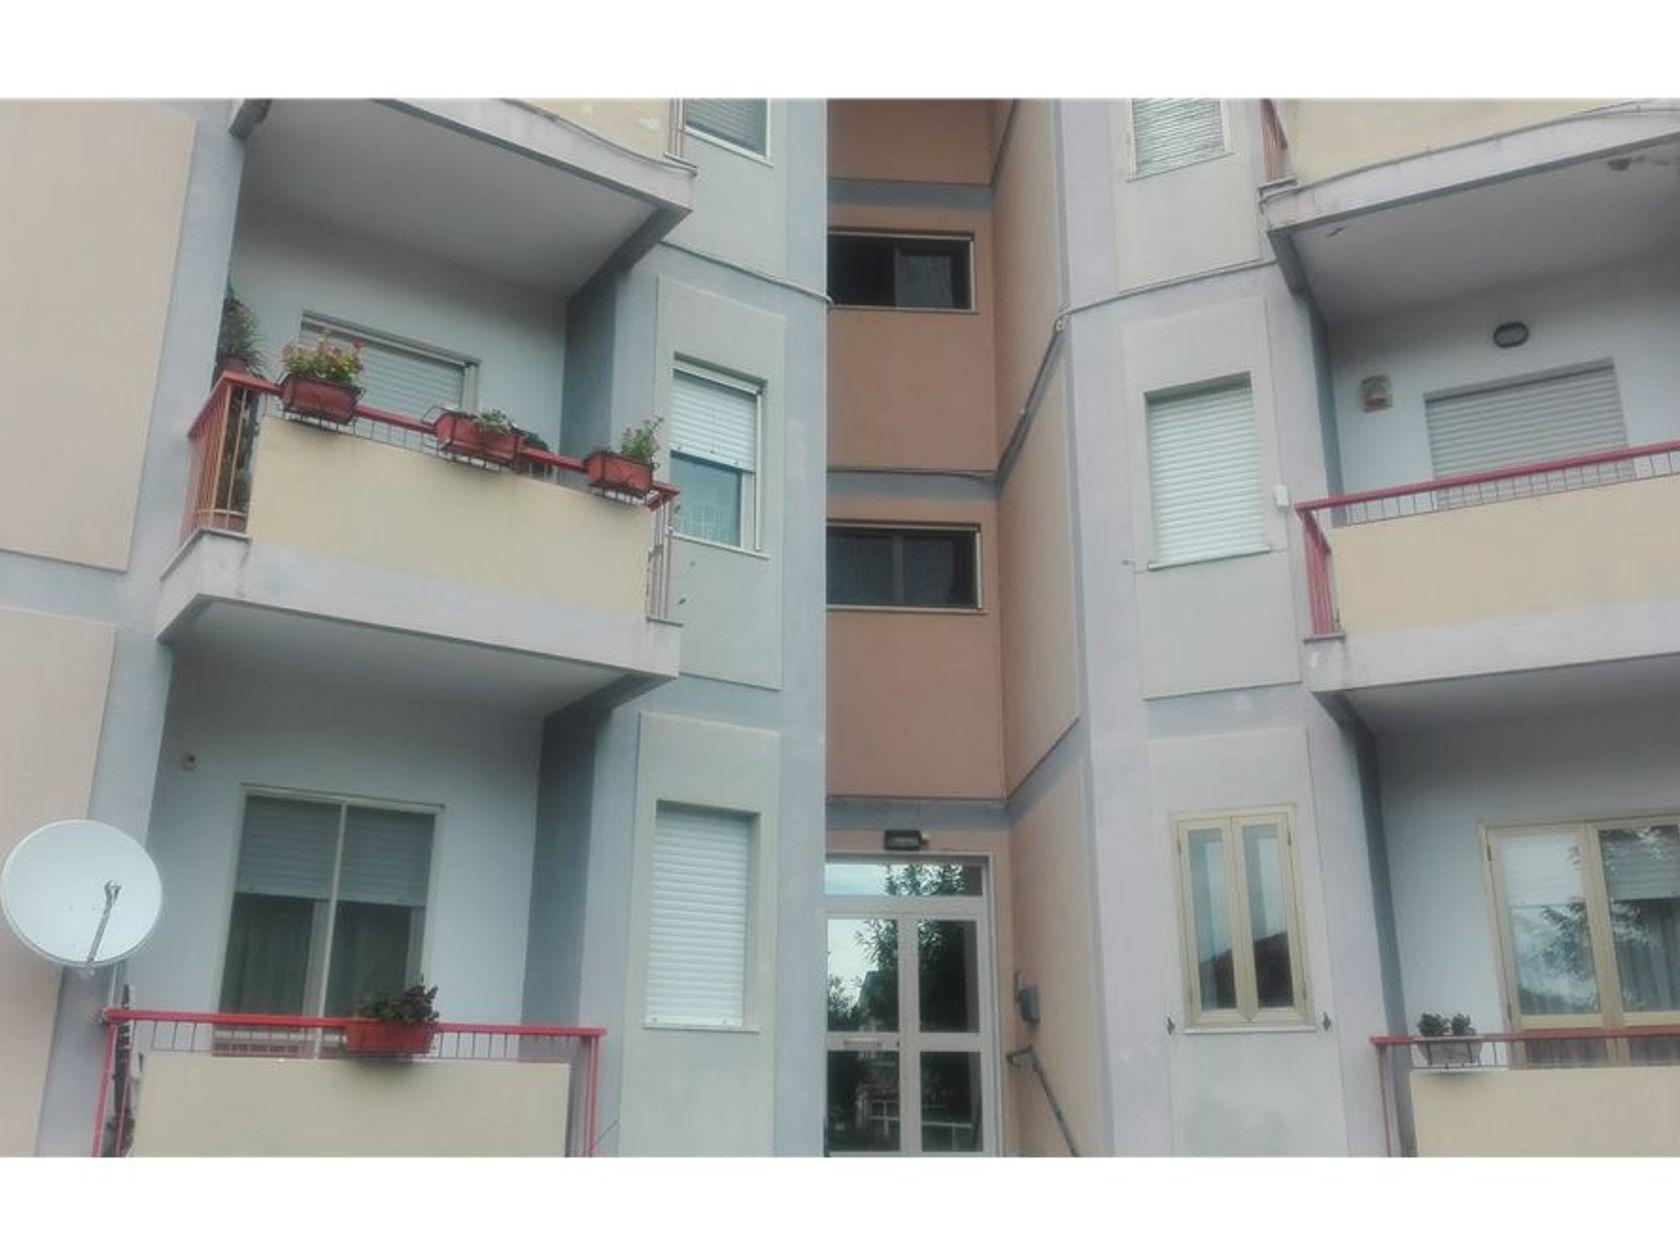 Appartamento Santa Maria, Catanzaro, CZ Vendita - Foto 2